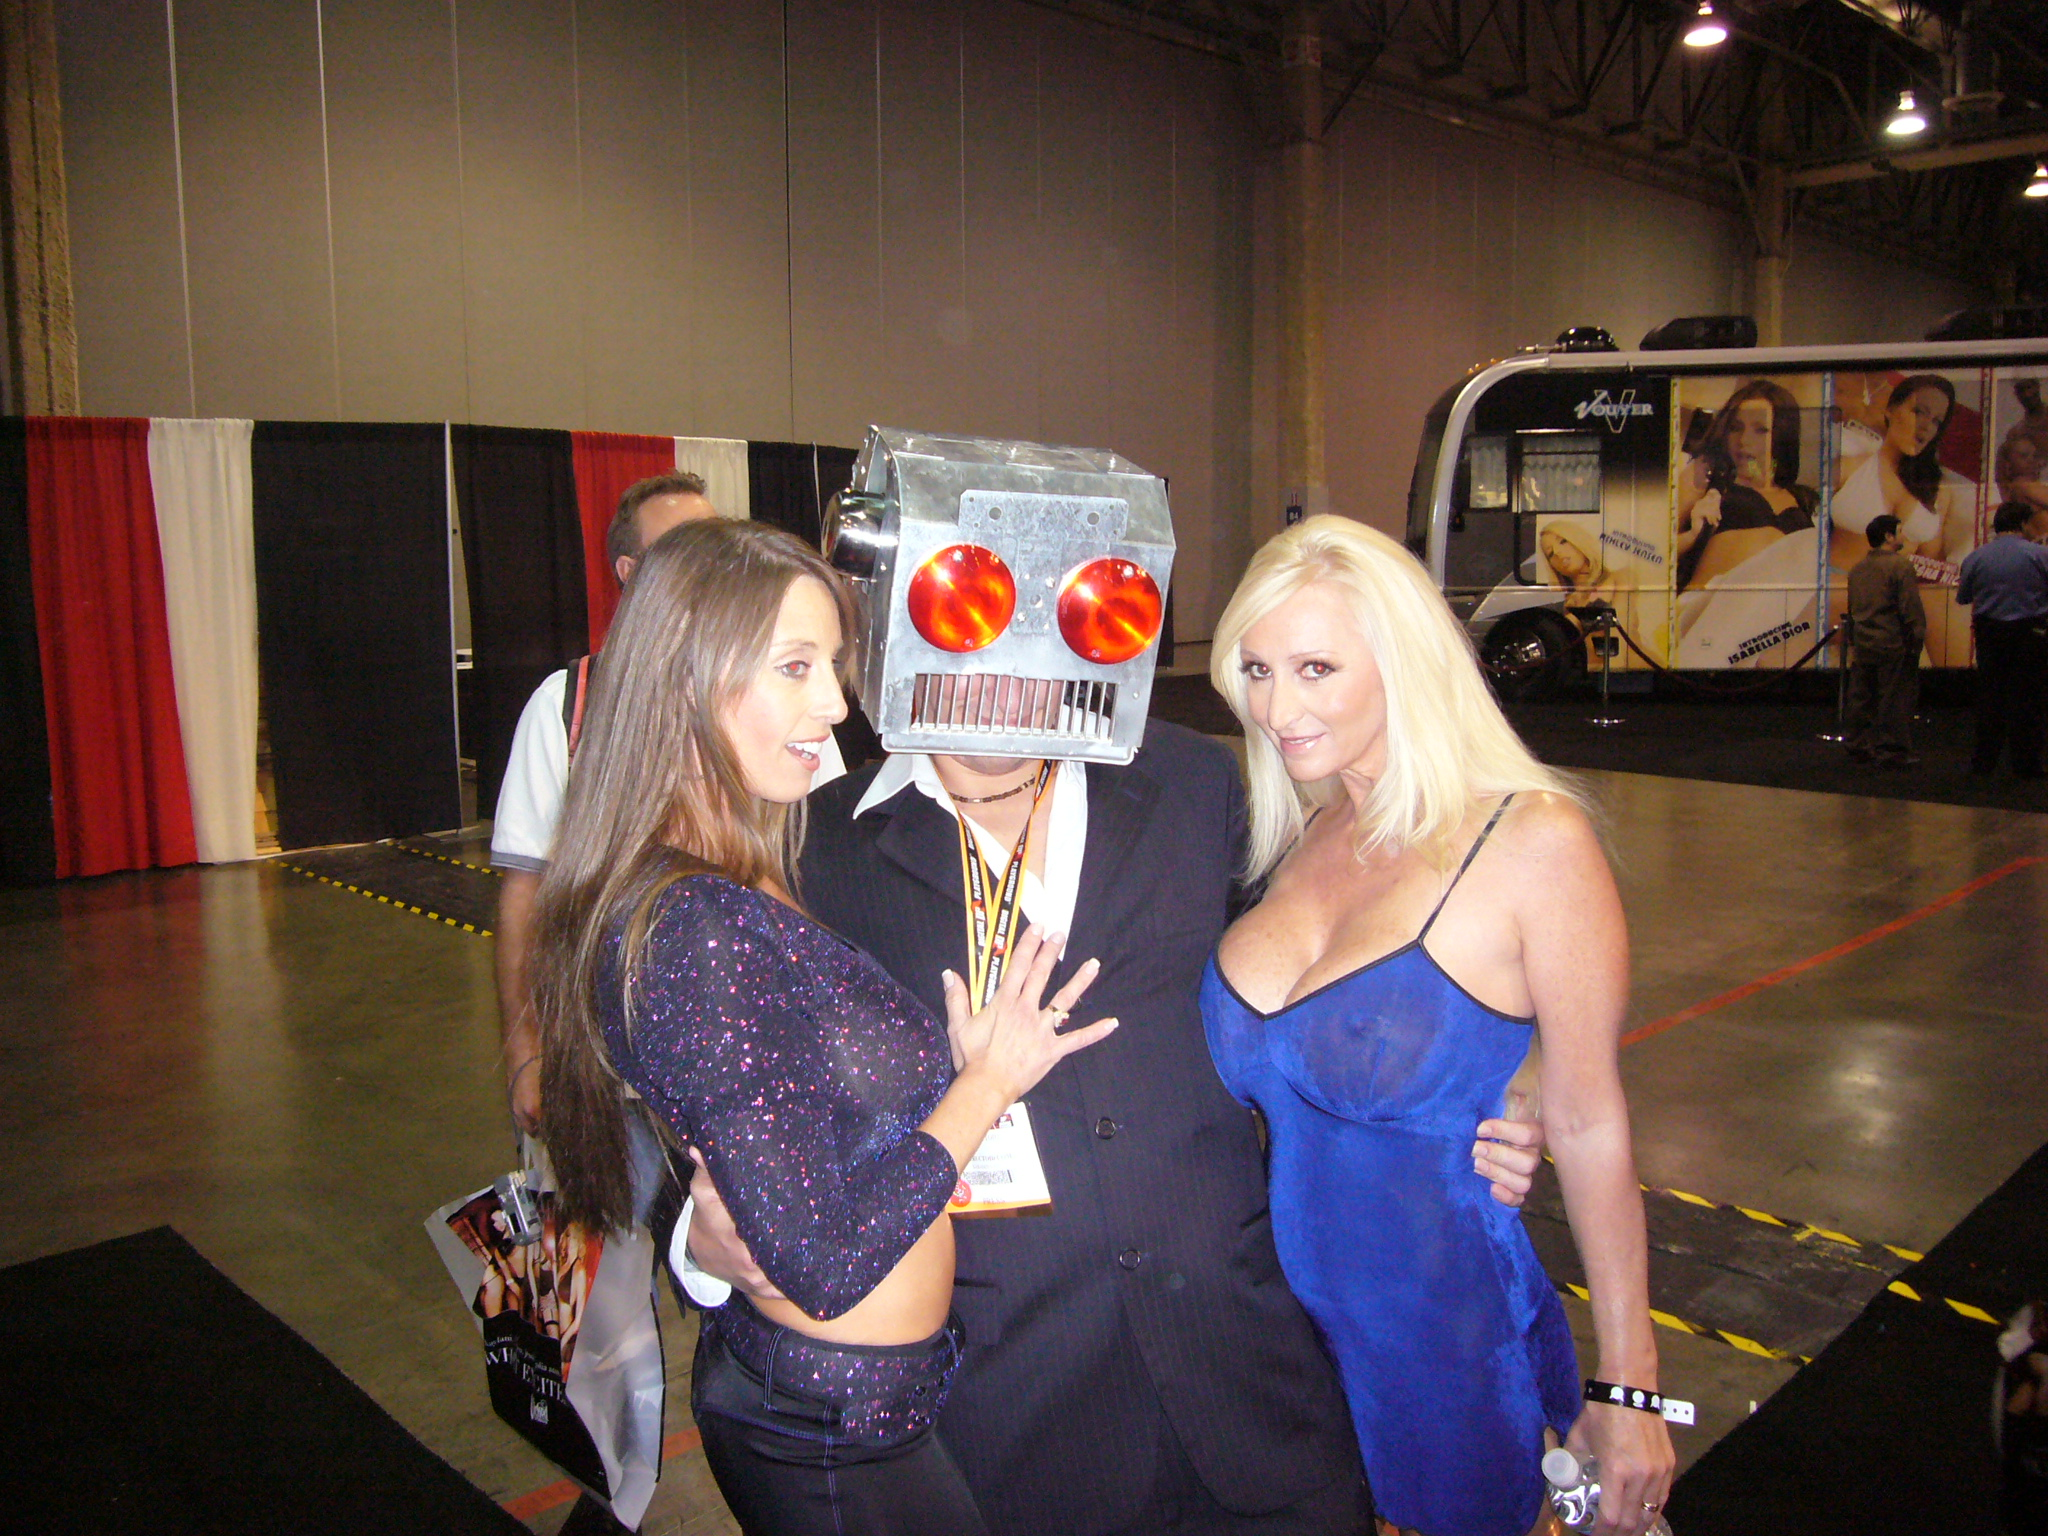 2007 adult entertainment expo photo